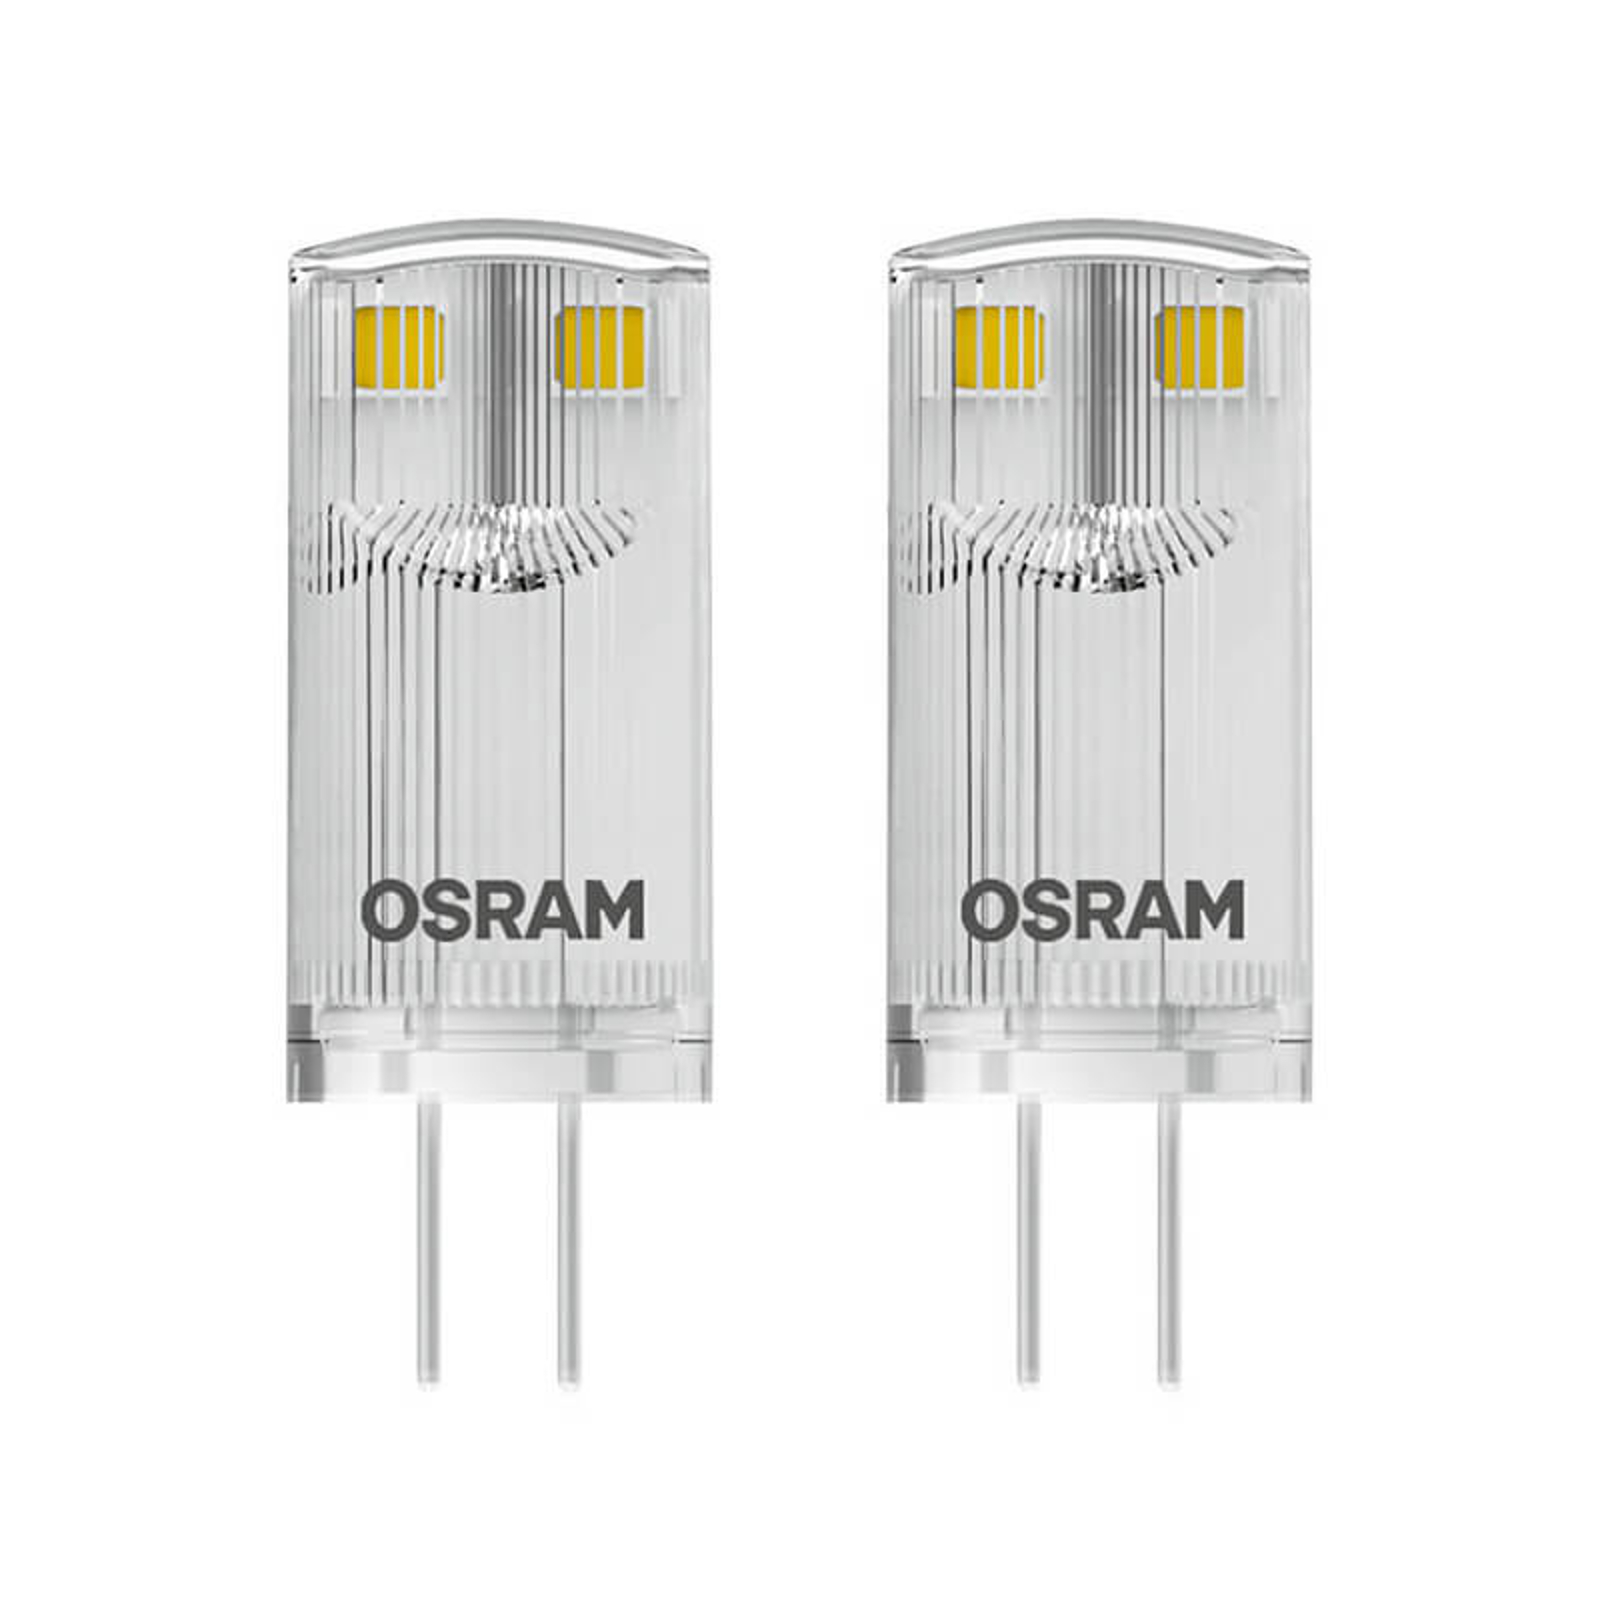 LED-Stiftsockellampe G4 0,9W 827, 2er Set